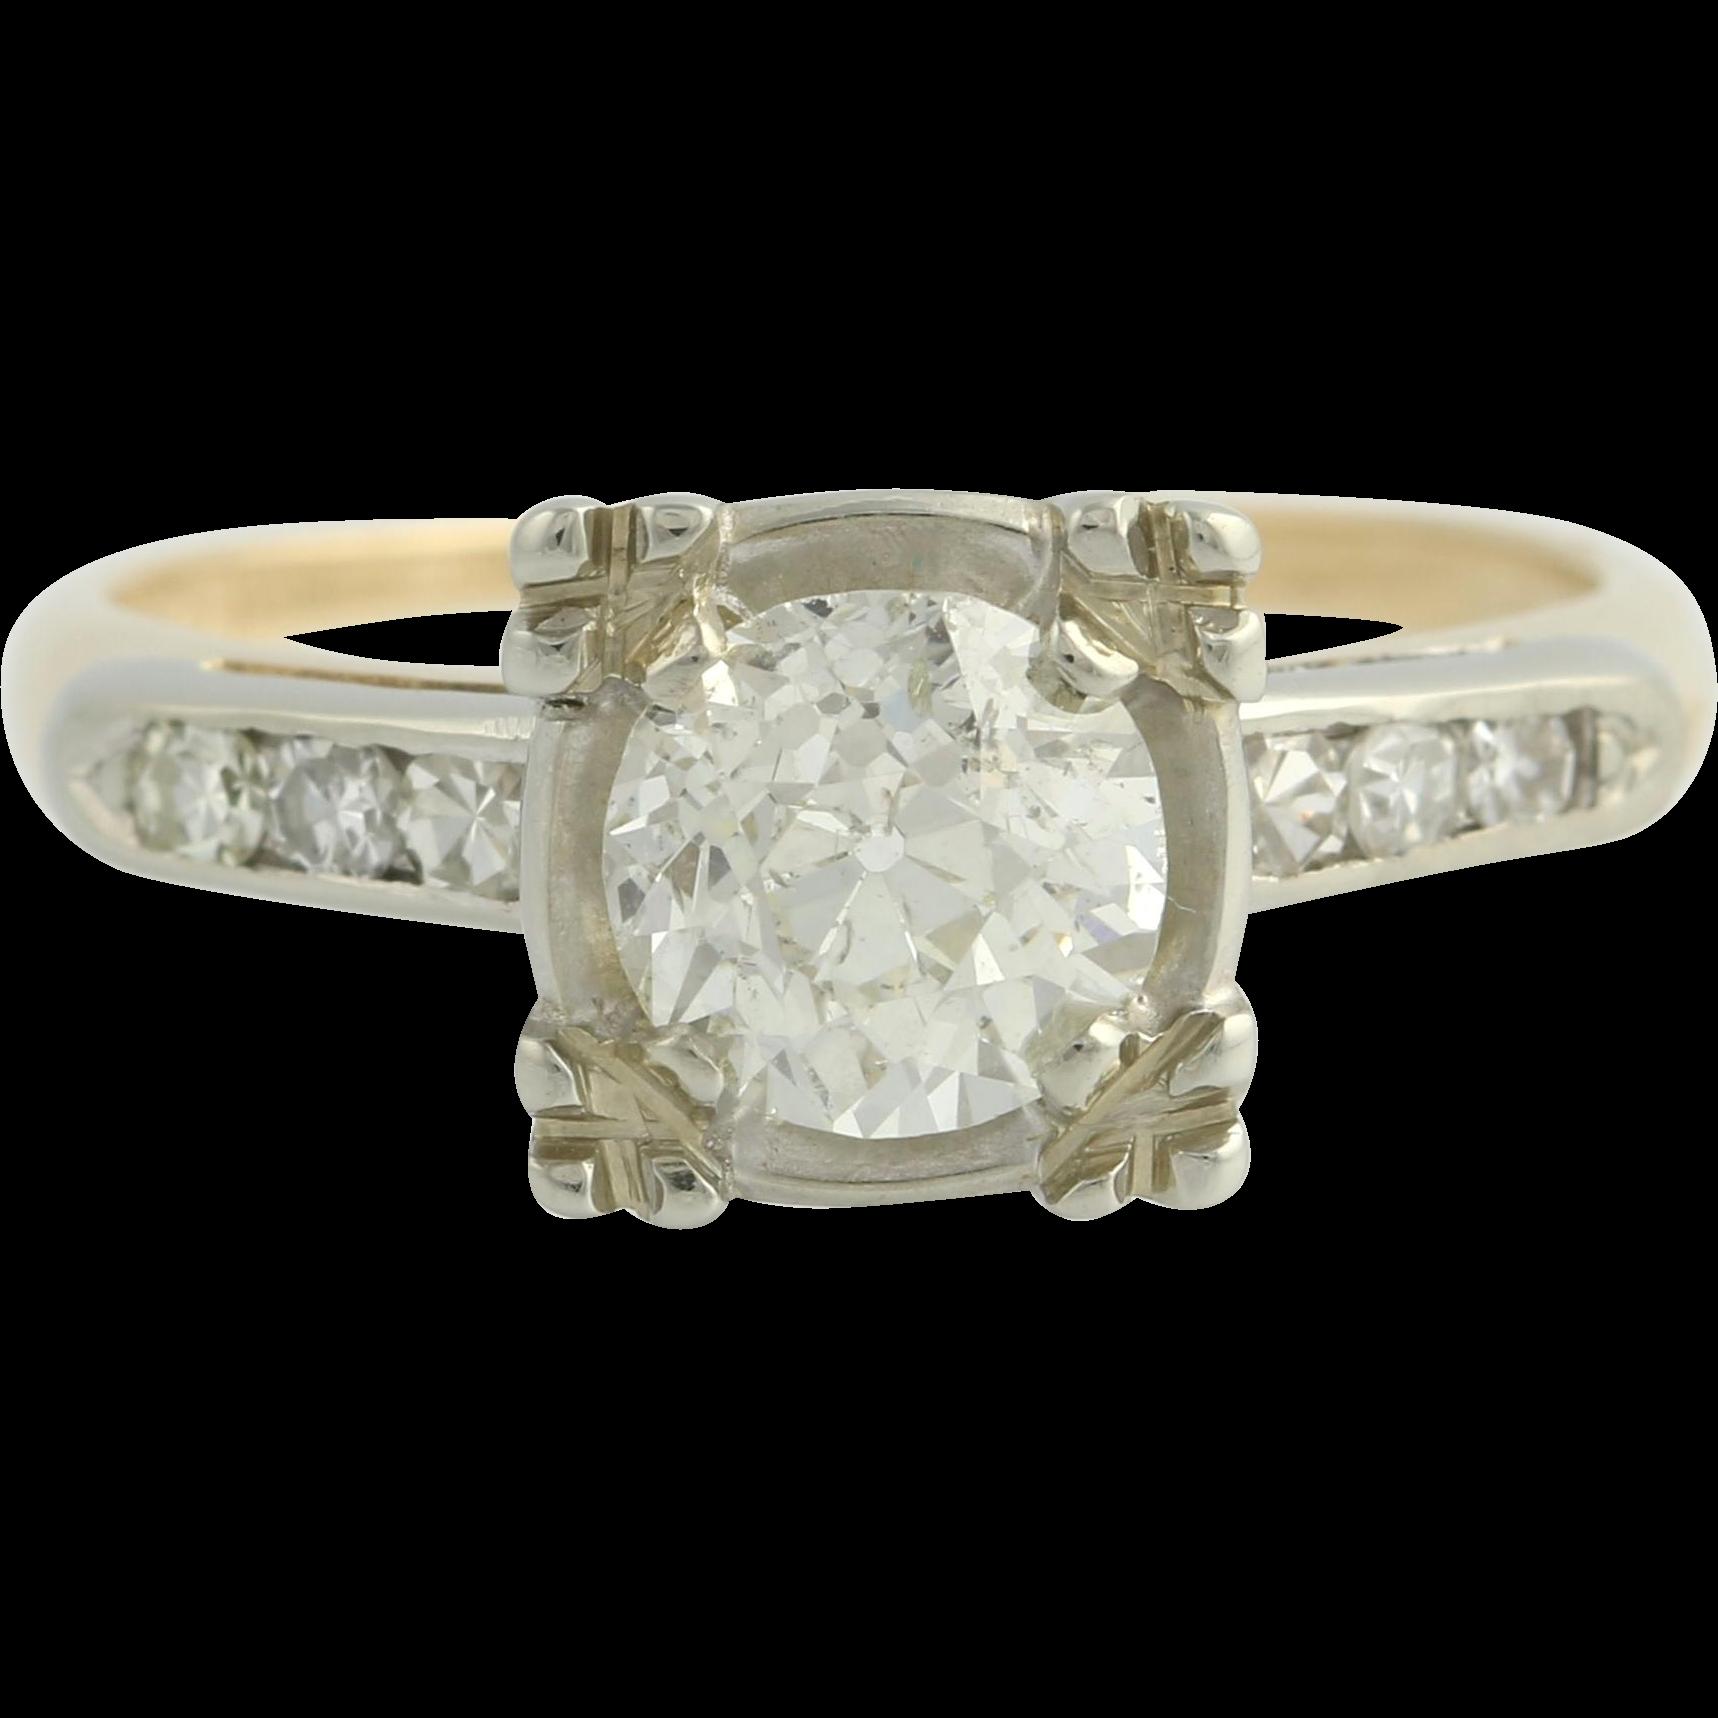 Art Deco Engagement Diamond Ring - Vintage 14k Yellow & White Gold Round 1.50ctw